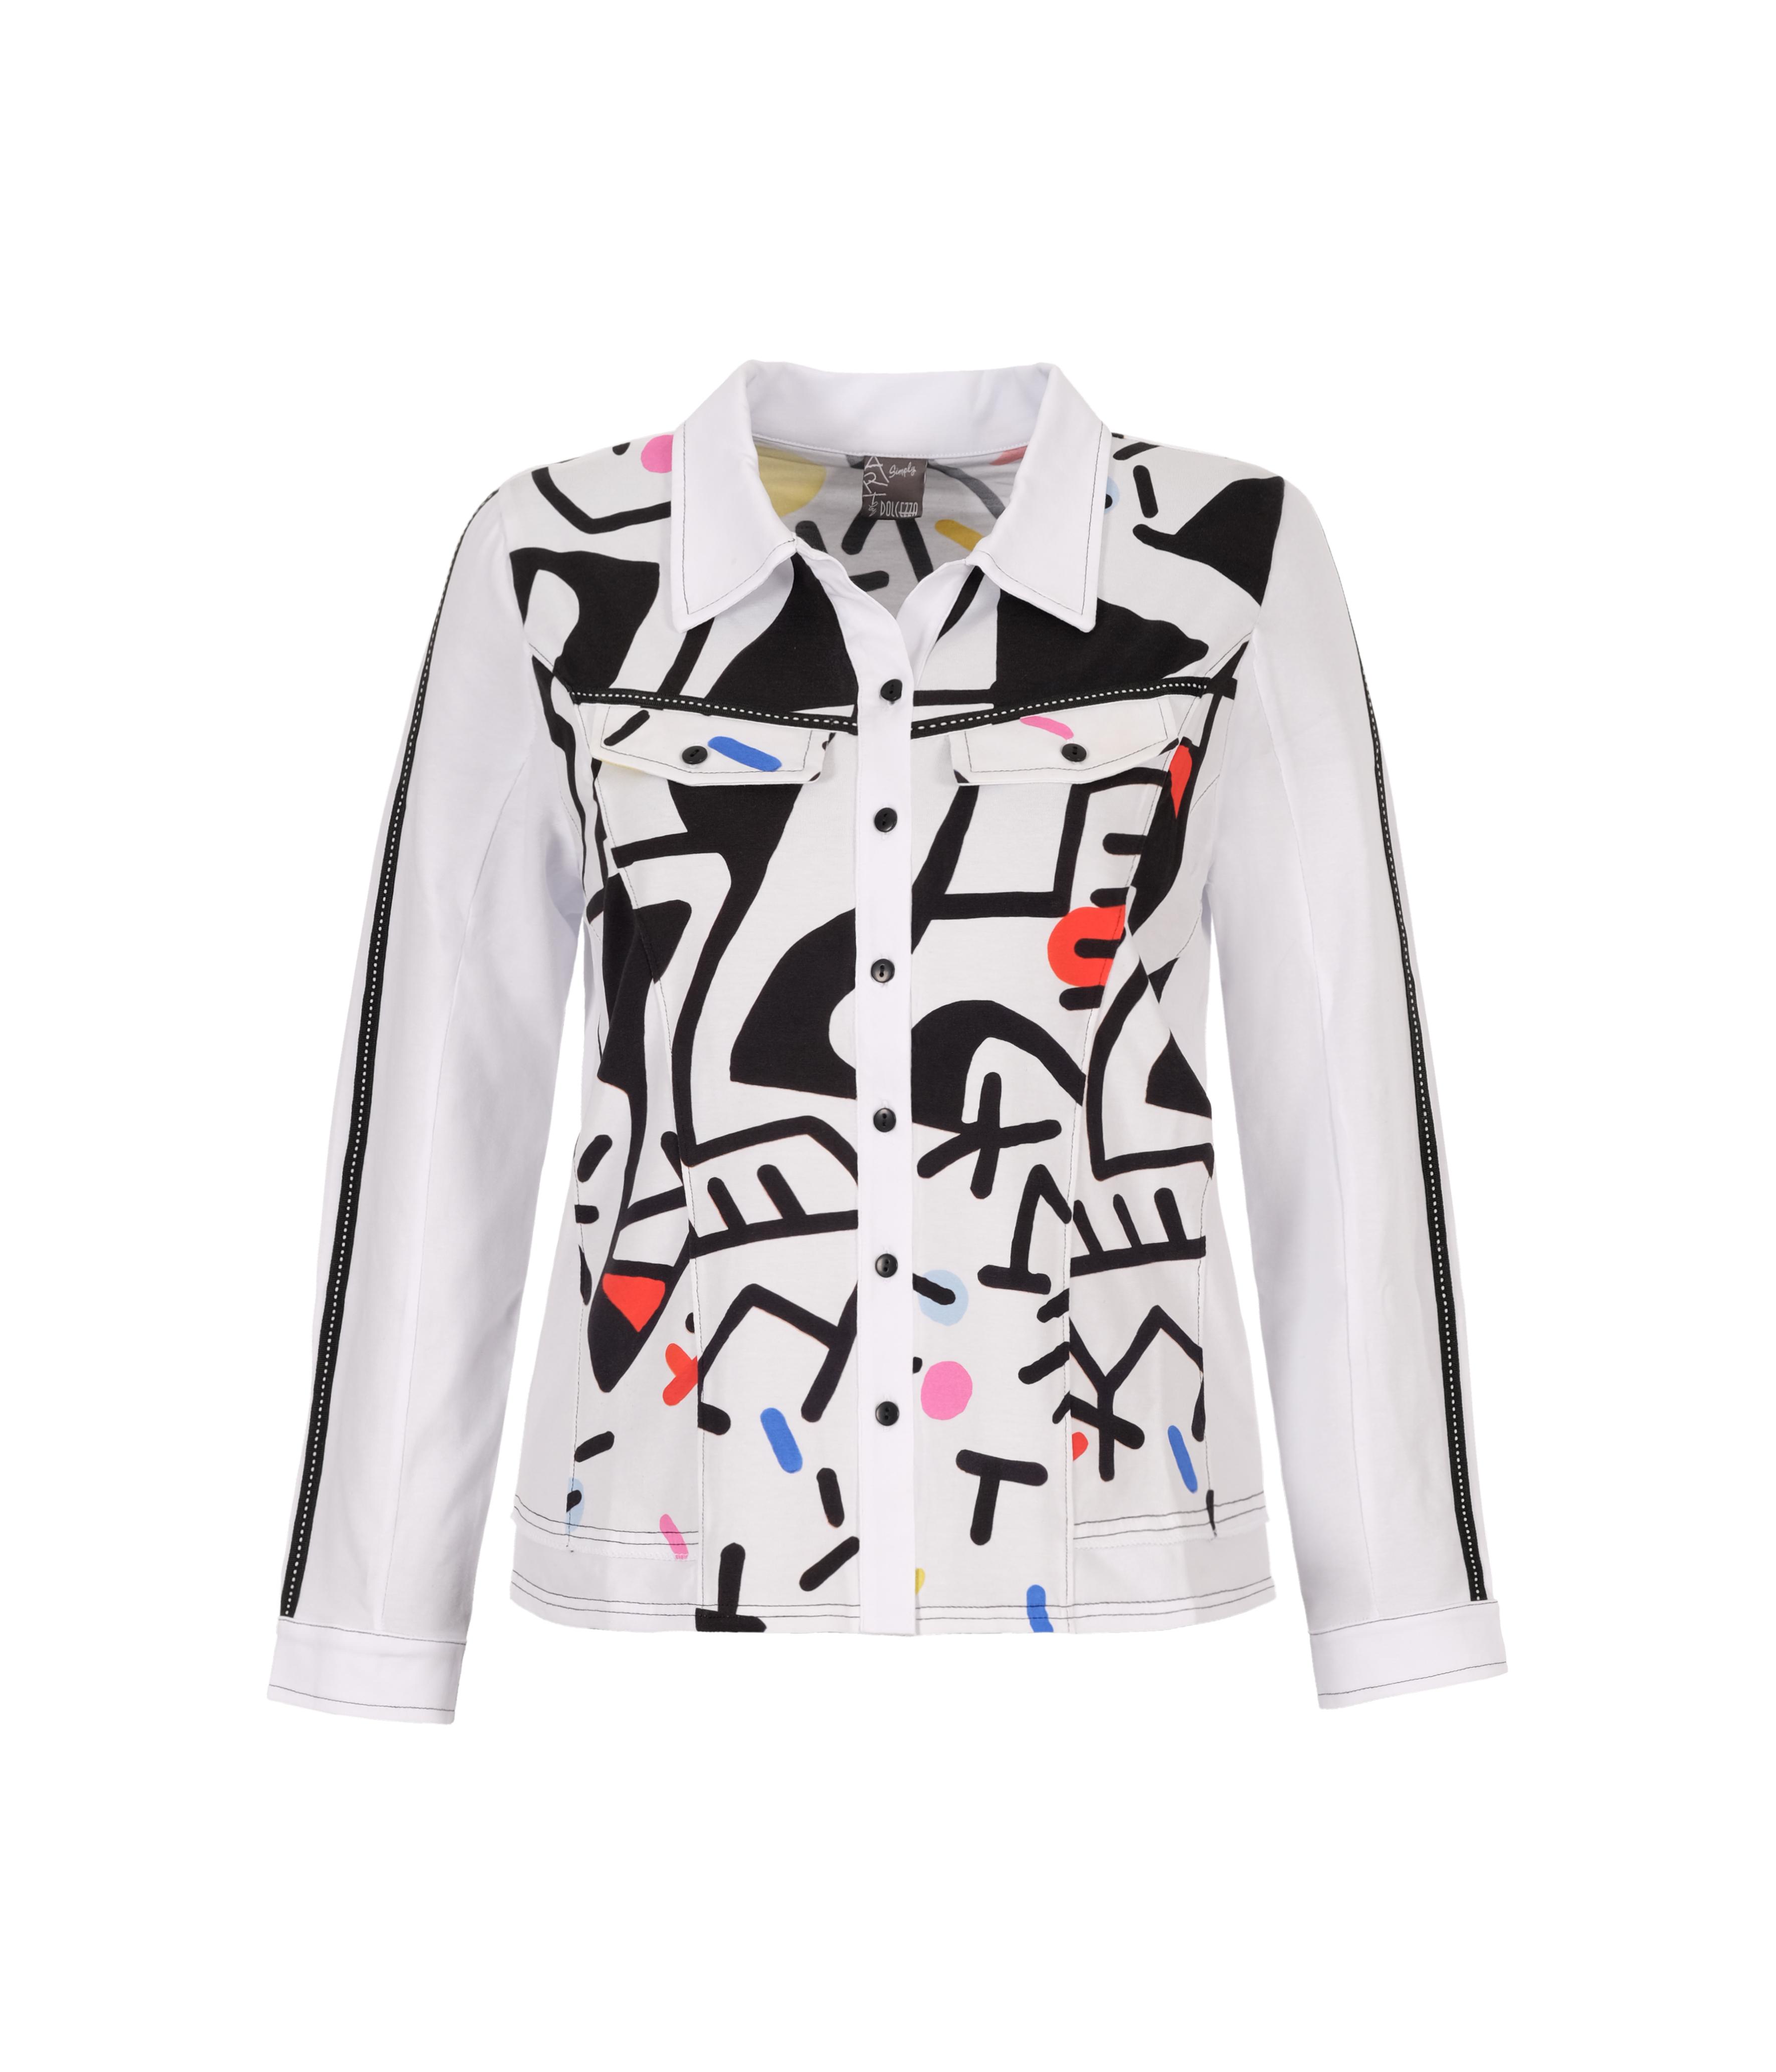 Simply Art Dolcezza: Naissance De L'Origine Asymmetrical Abstract Art Buttoned Cardigan Blouse Dolcezza_SimplyArt_21676